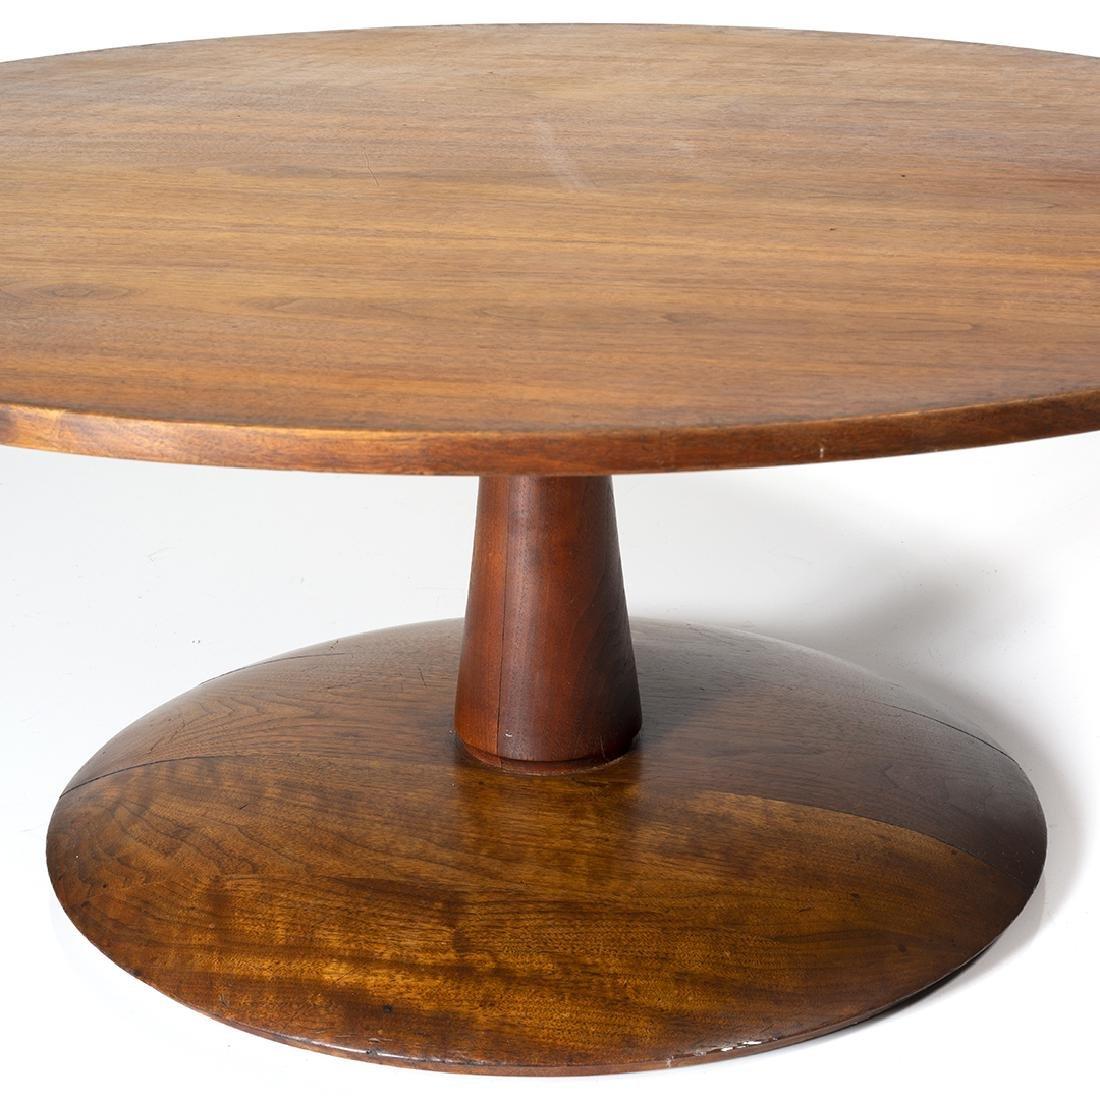 Modernist Coffee Table - 3